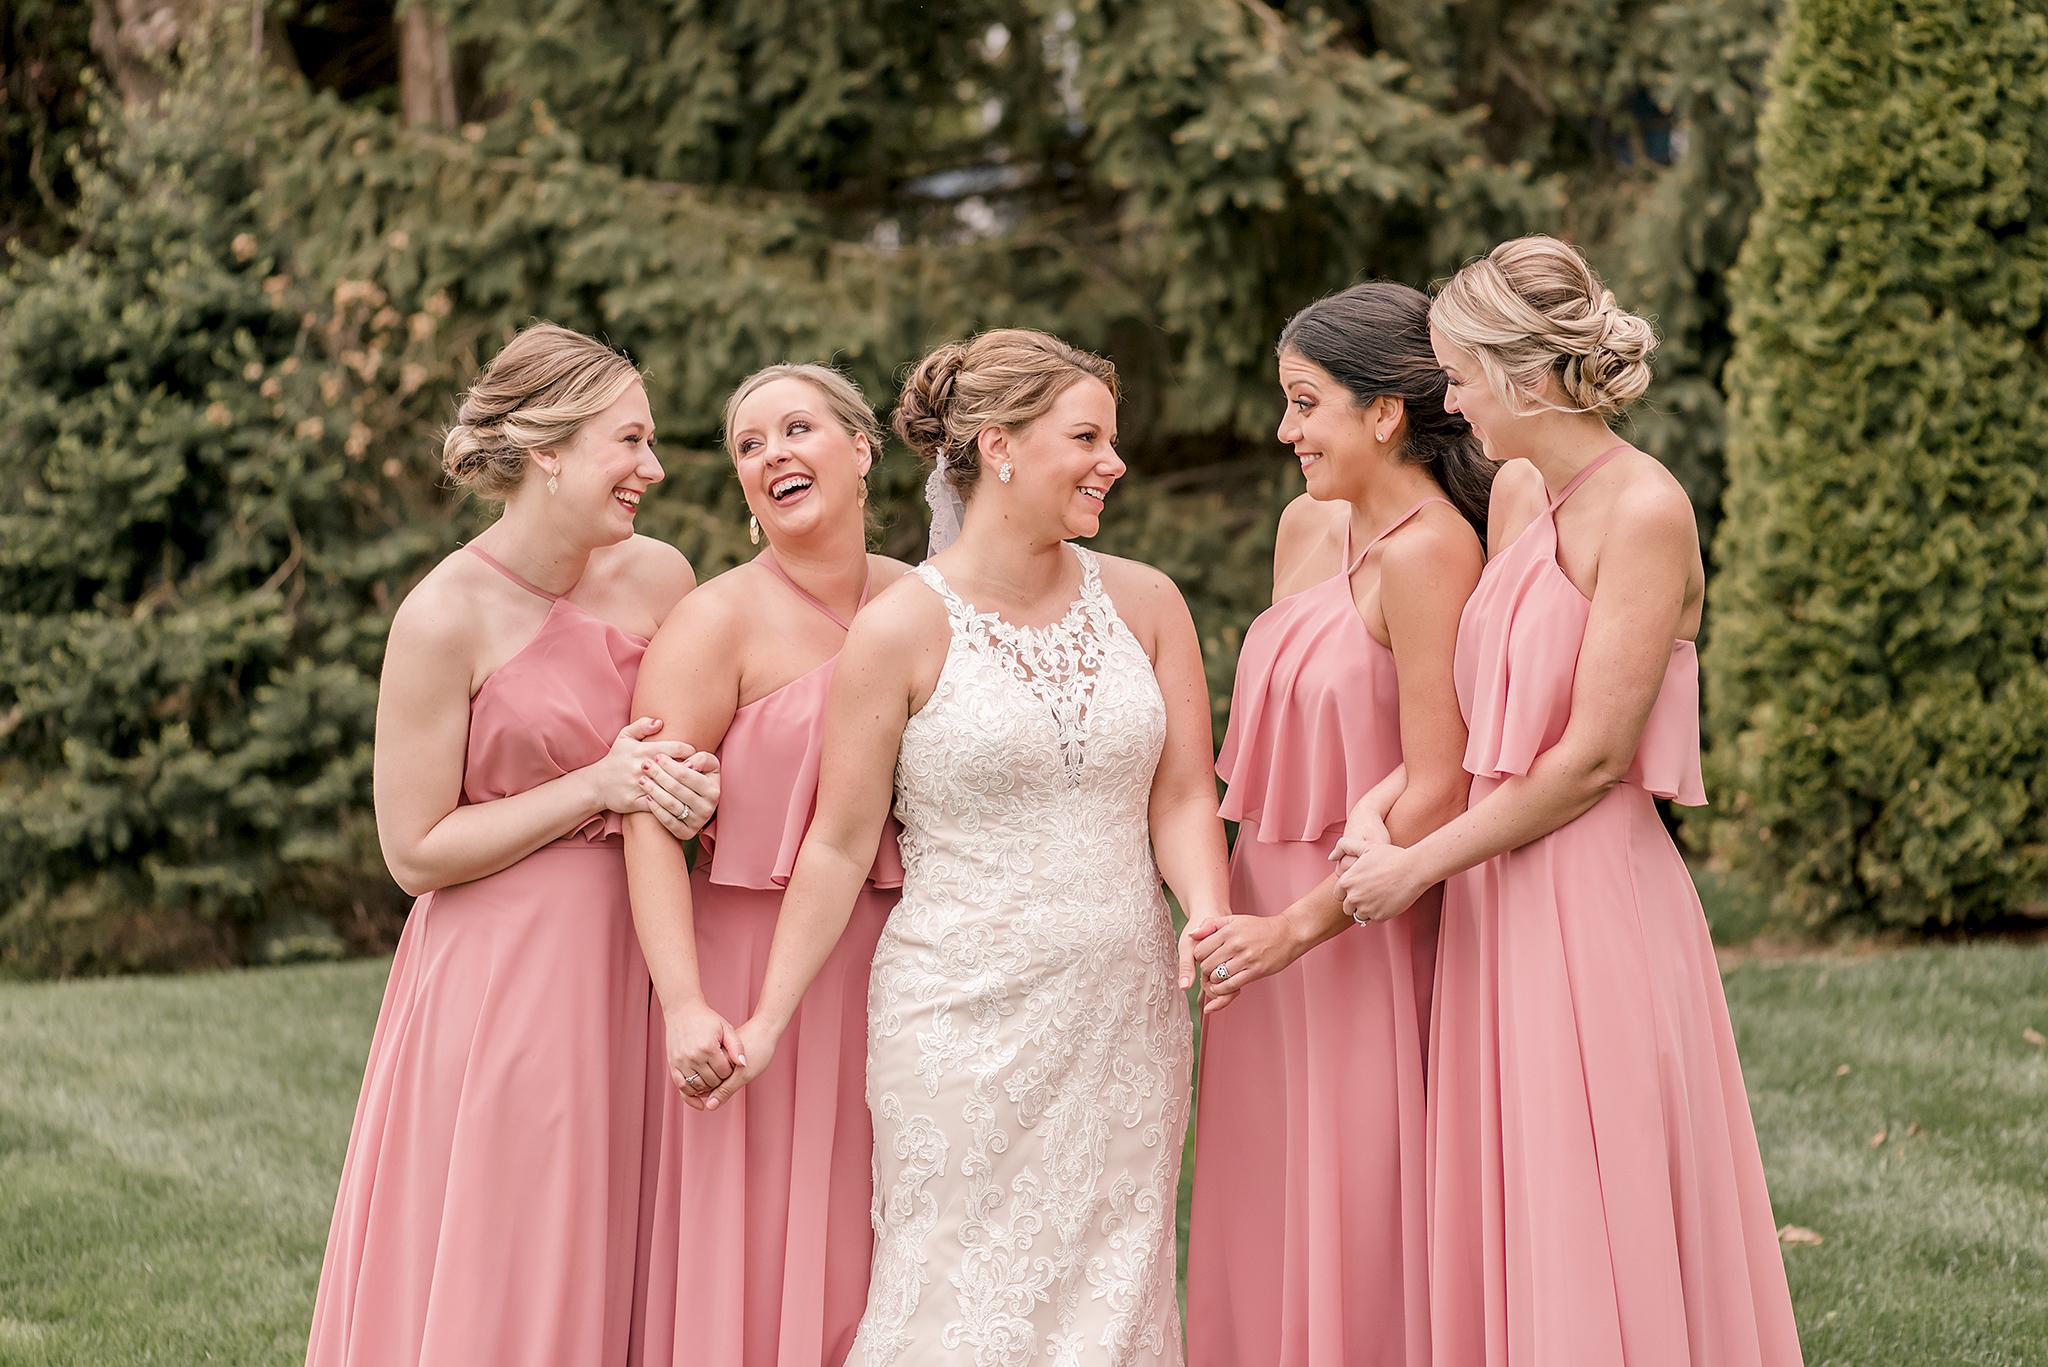 LINDSAY-ADKINS-PHOTOGRAPHY-MICHIGAN-WEDDING-PHOTOGRAPHER-FRANKENMUTH-BREWERY-WEDDING-MICHIGAN-BLOG-16